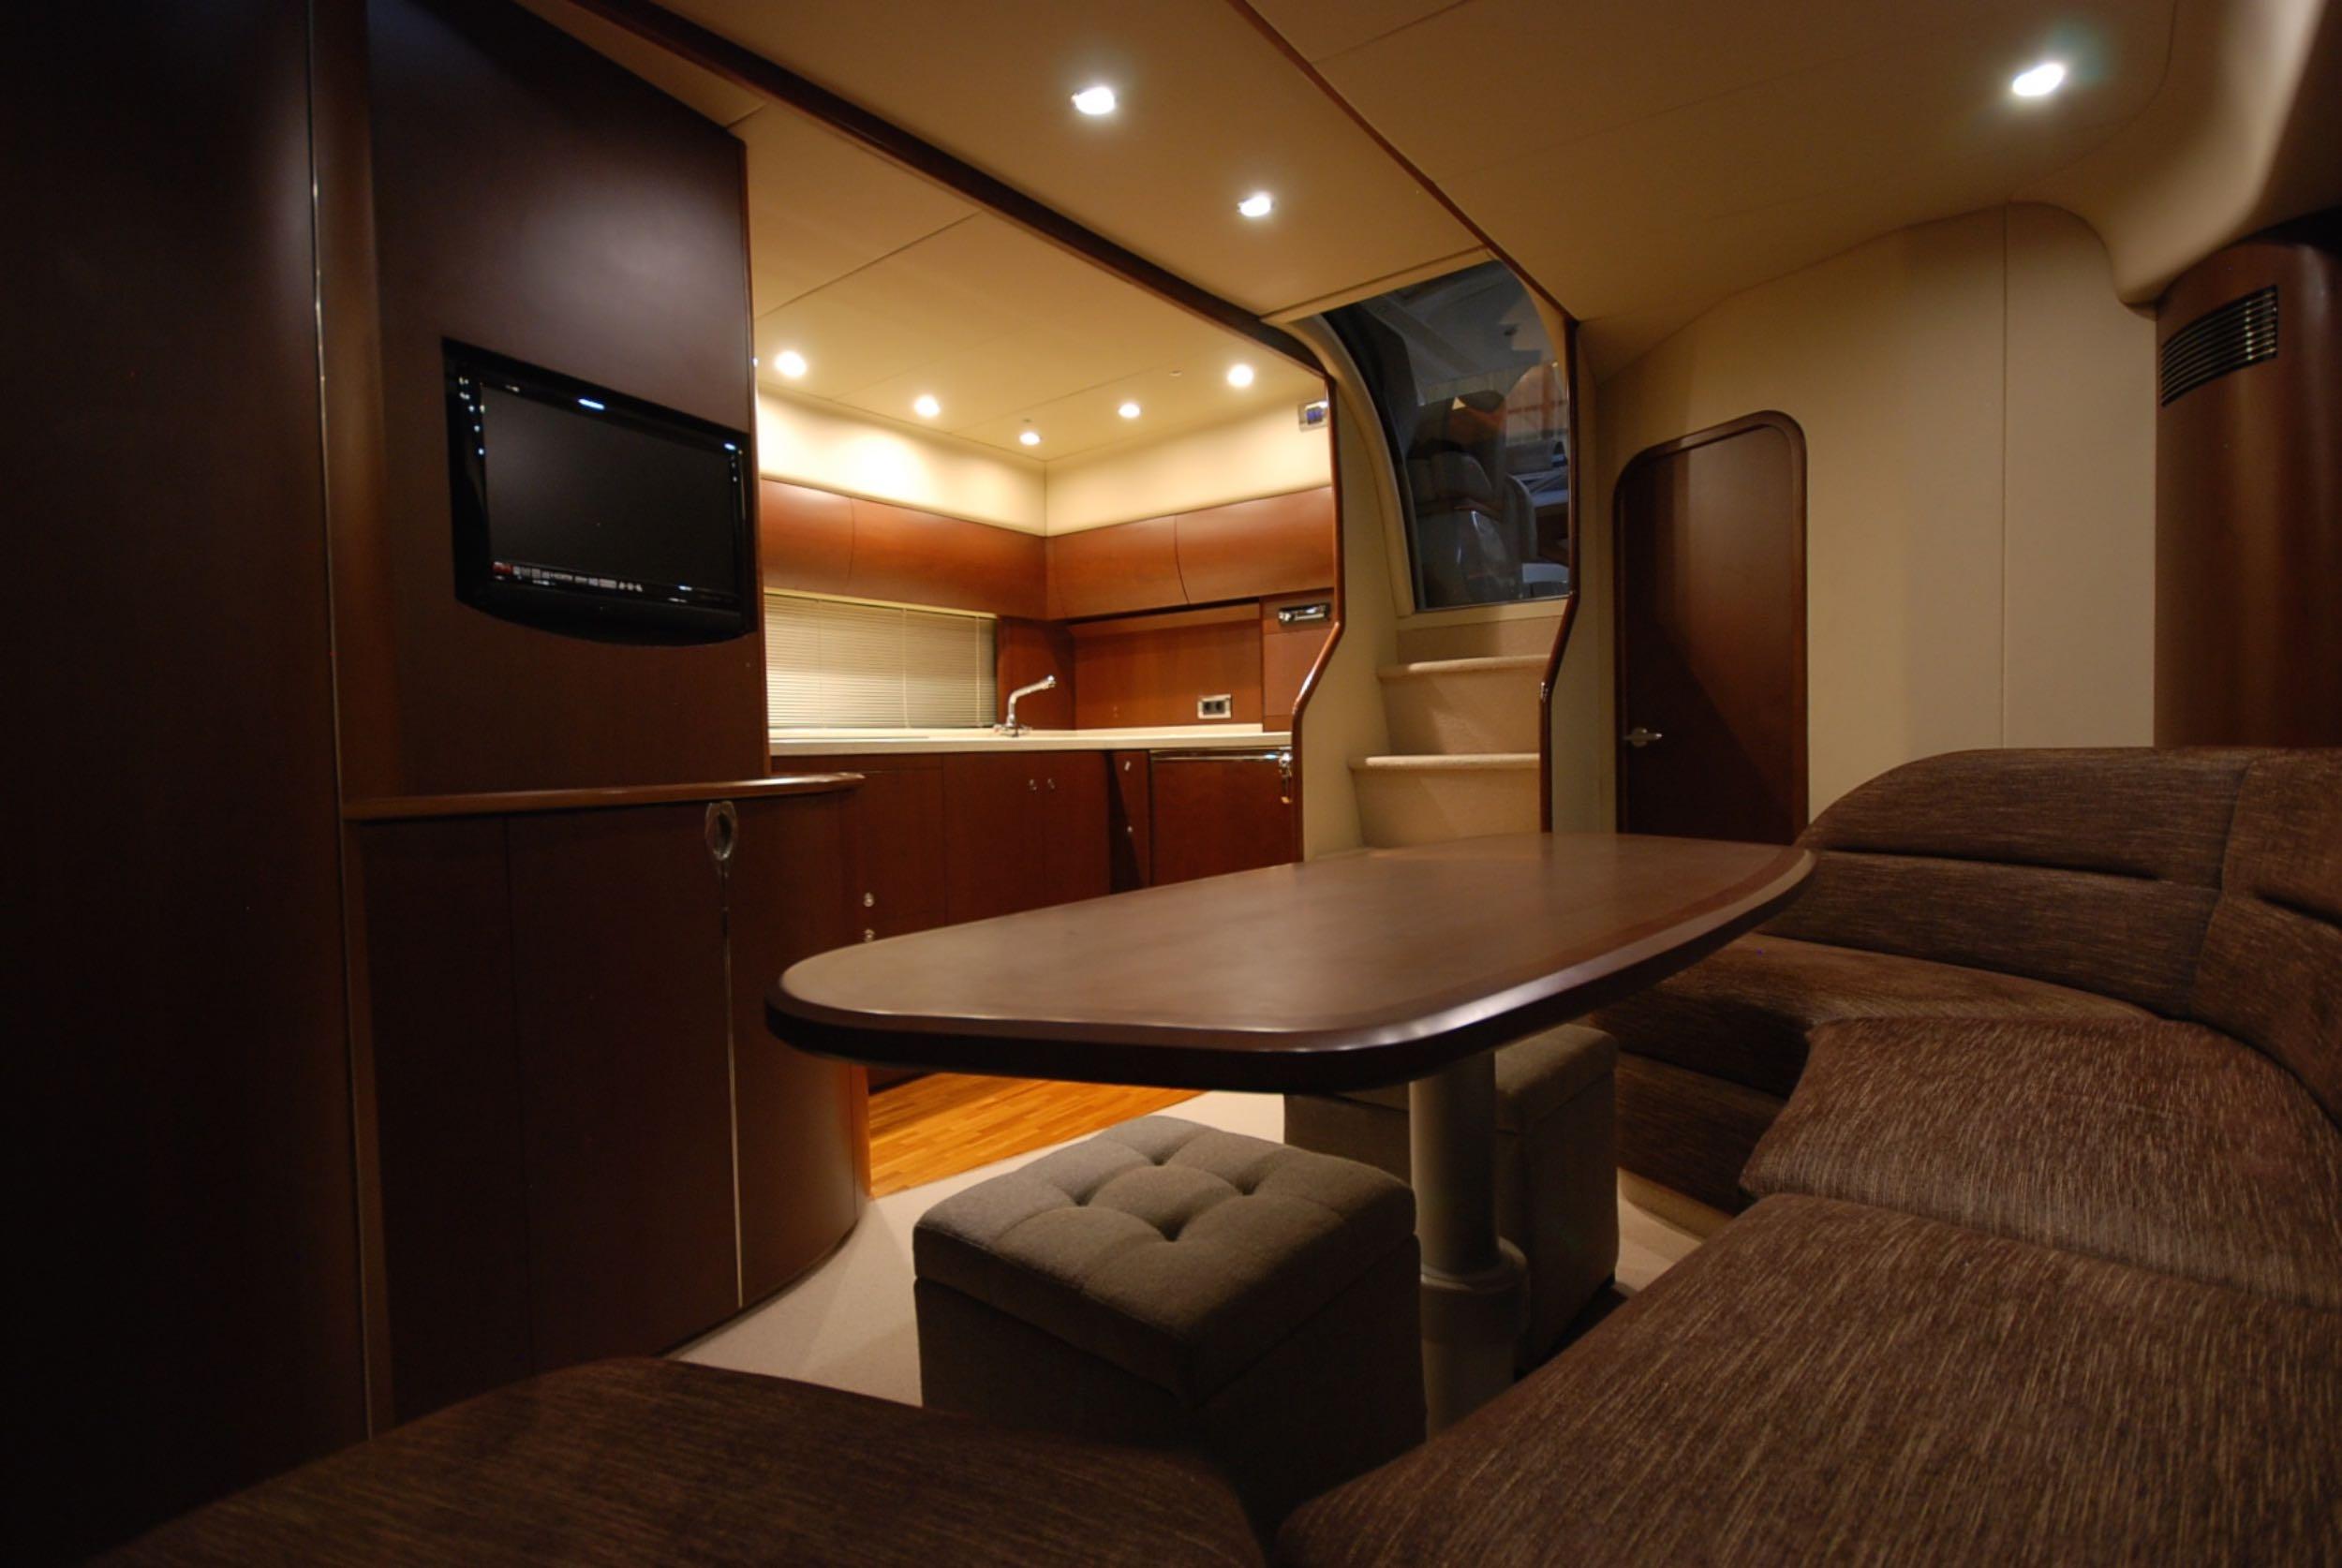 princess-yachts-v58-maestro-di-vita-for-sale-15.jpg